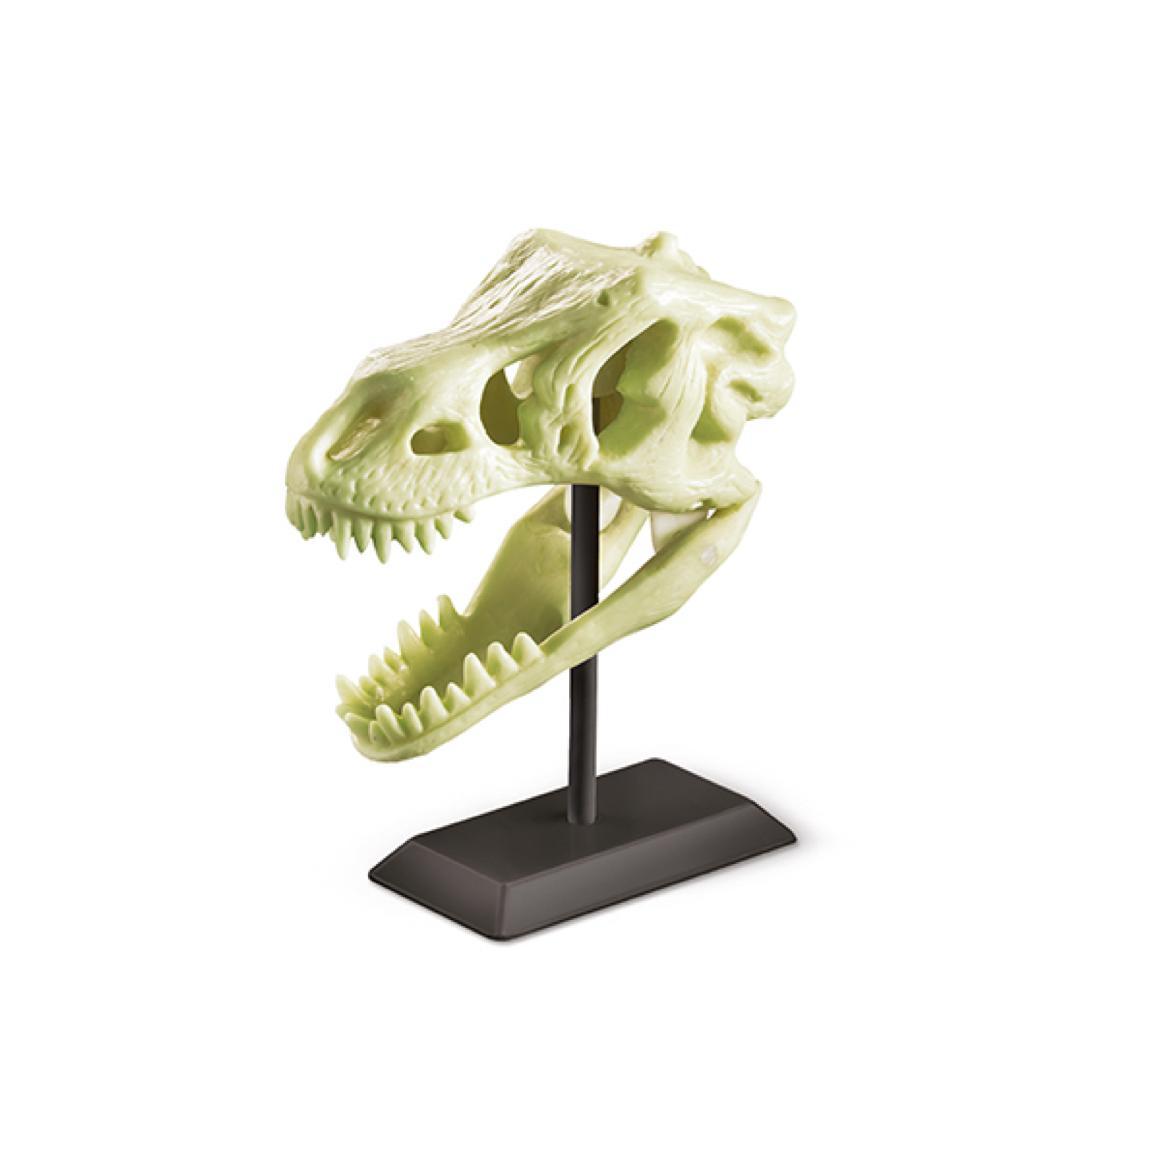 kit-de-paleontologo-glow-fossil-science-de-4m-en-el-mundo-de-mico-4